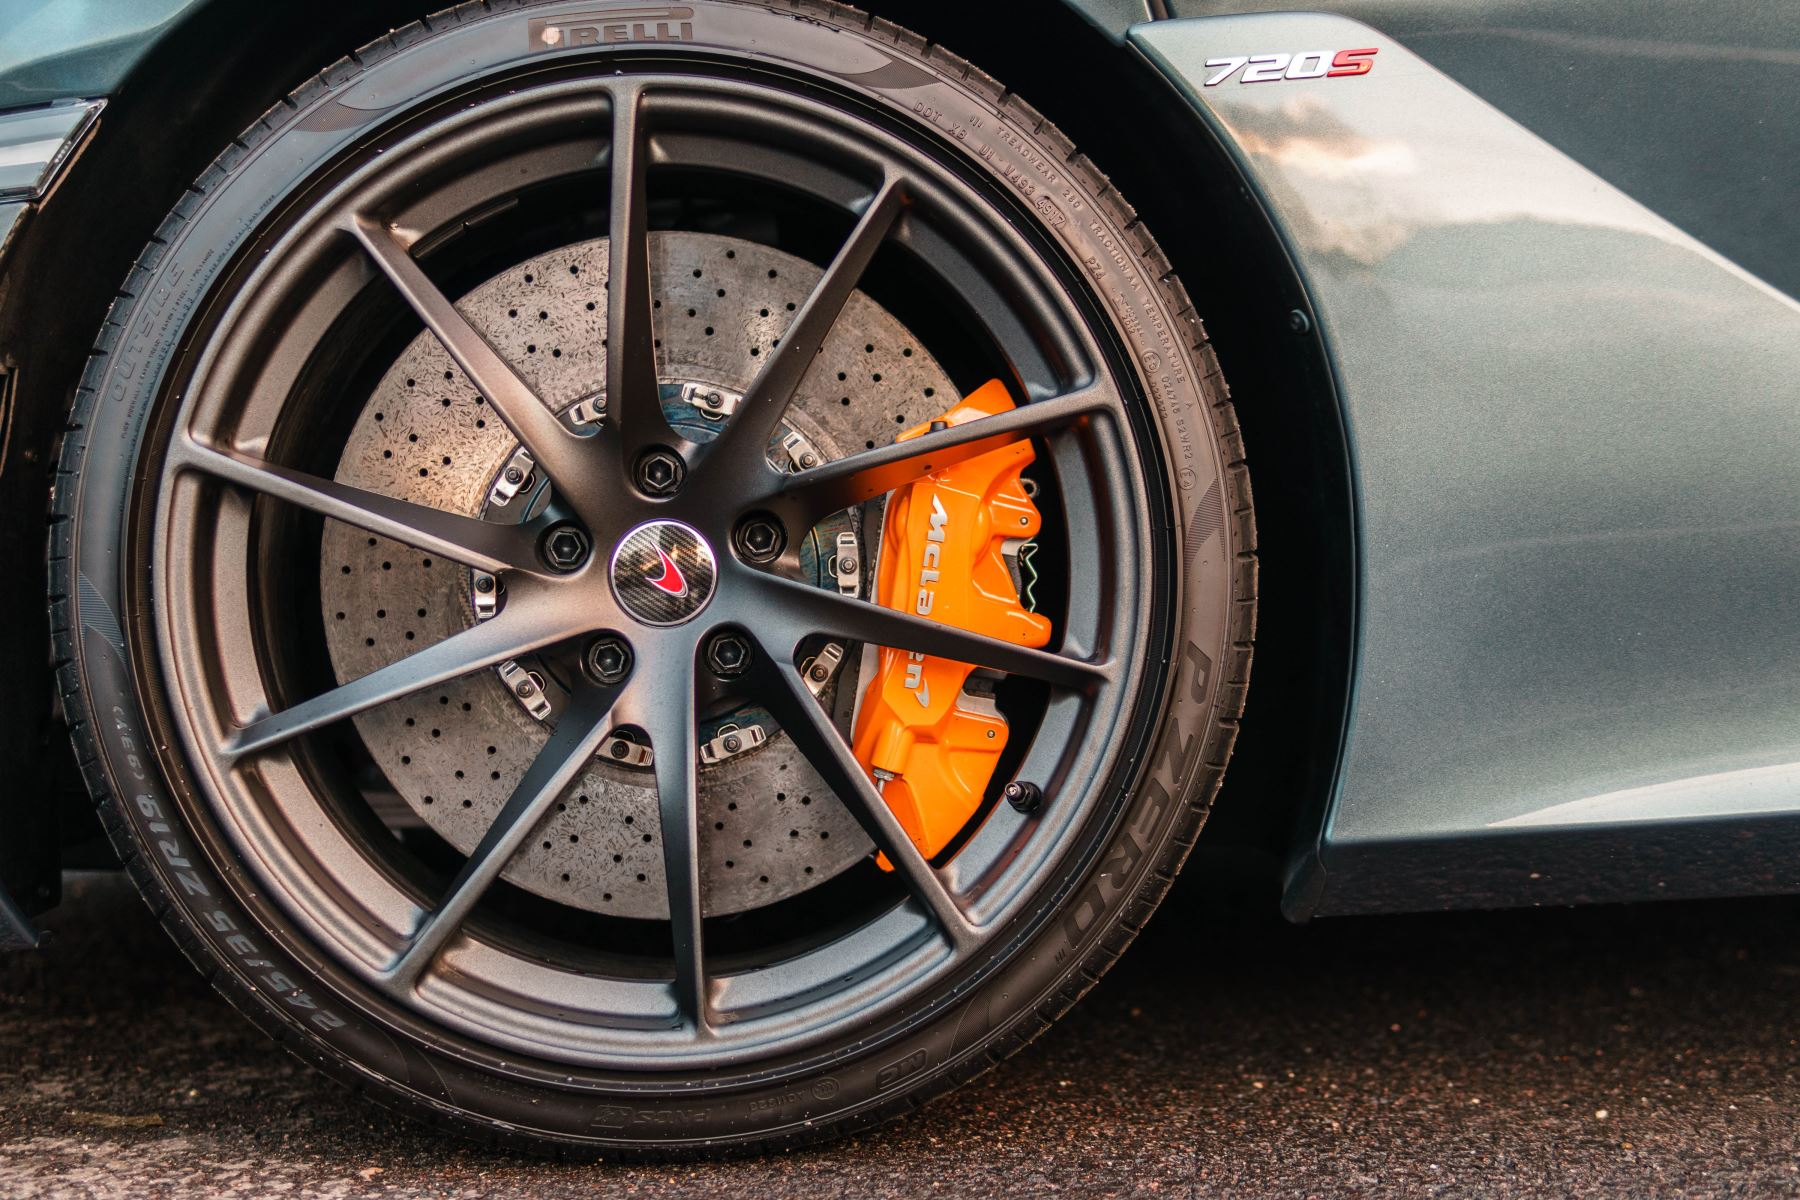 McLaren 720S Performance Coupe  image 40